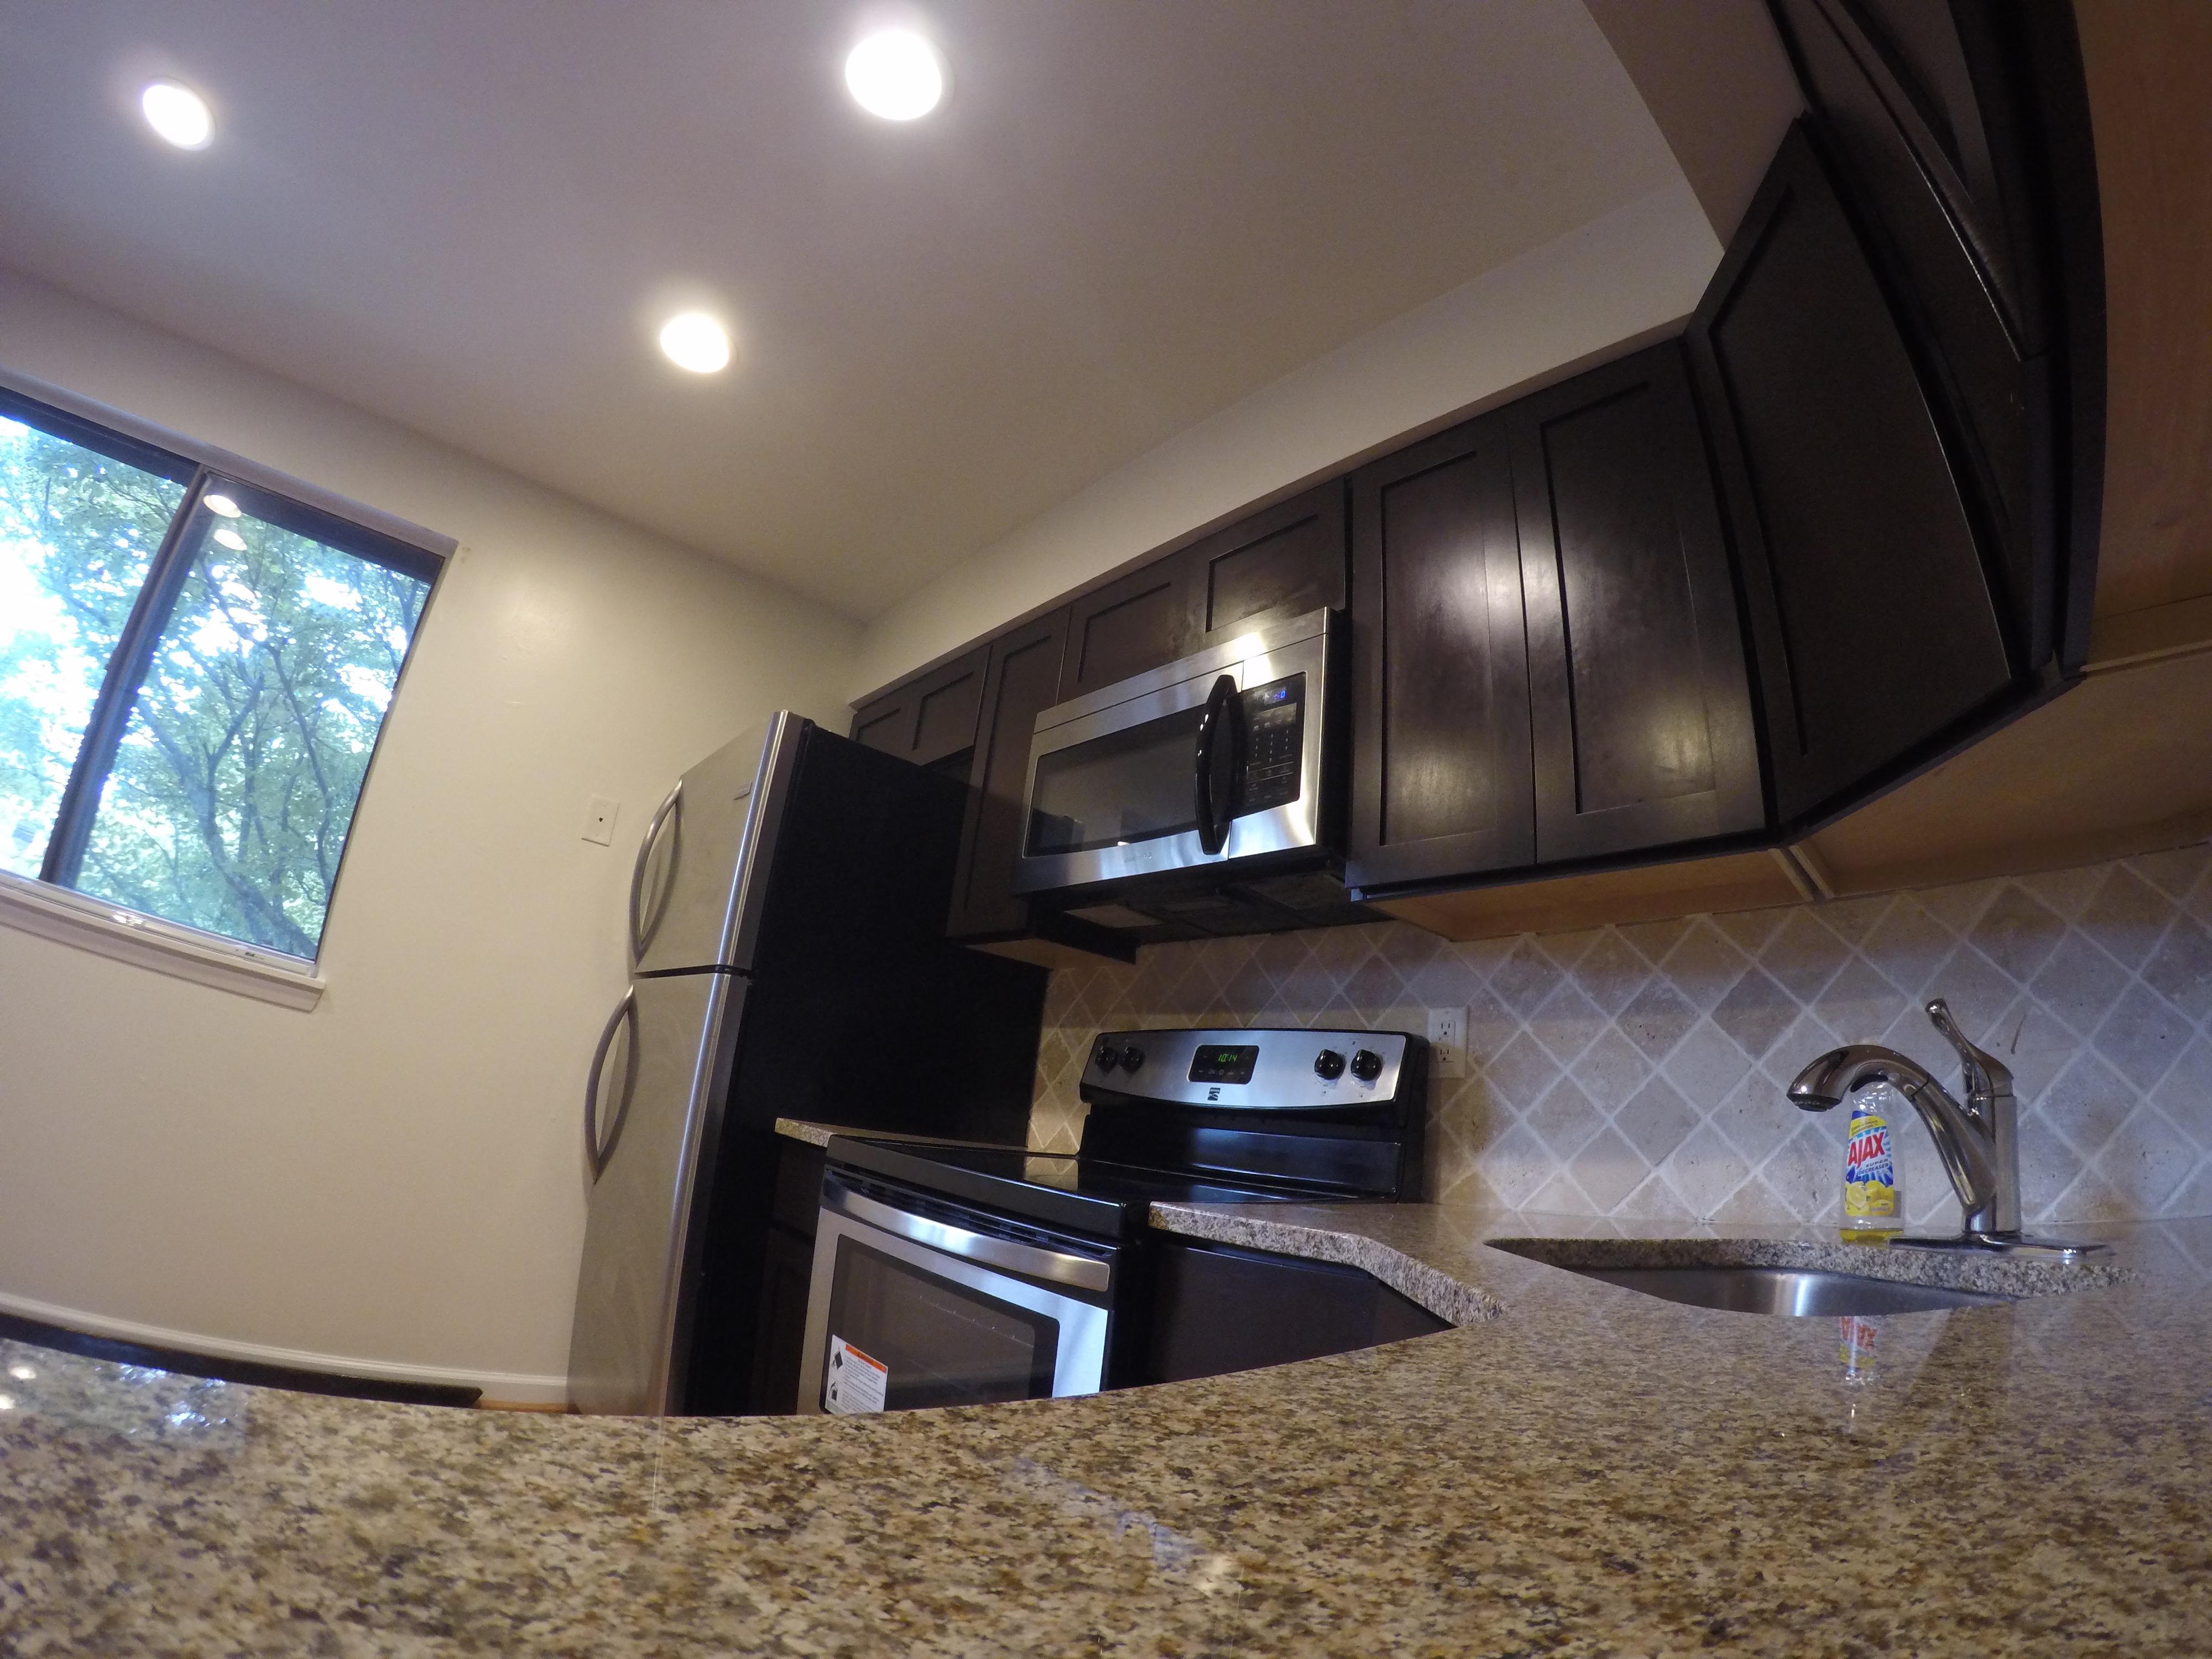 7358 Kerry Hill LivingSimple Properties